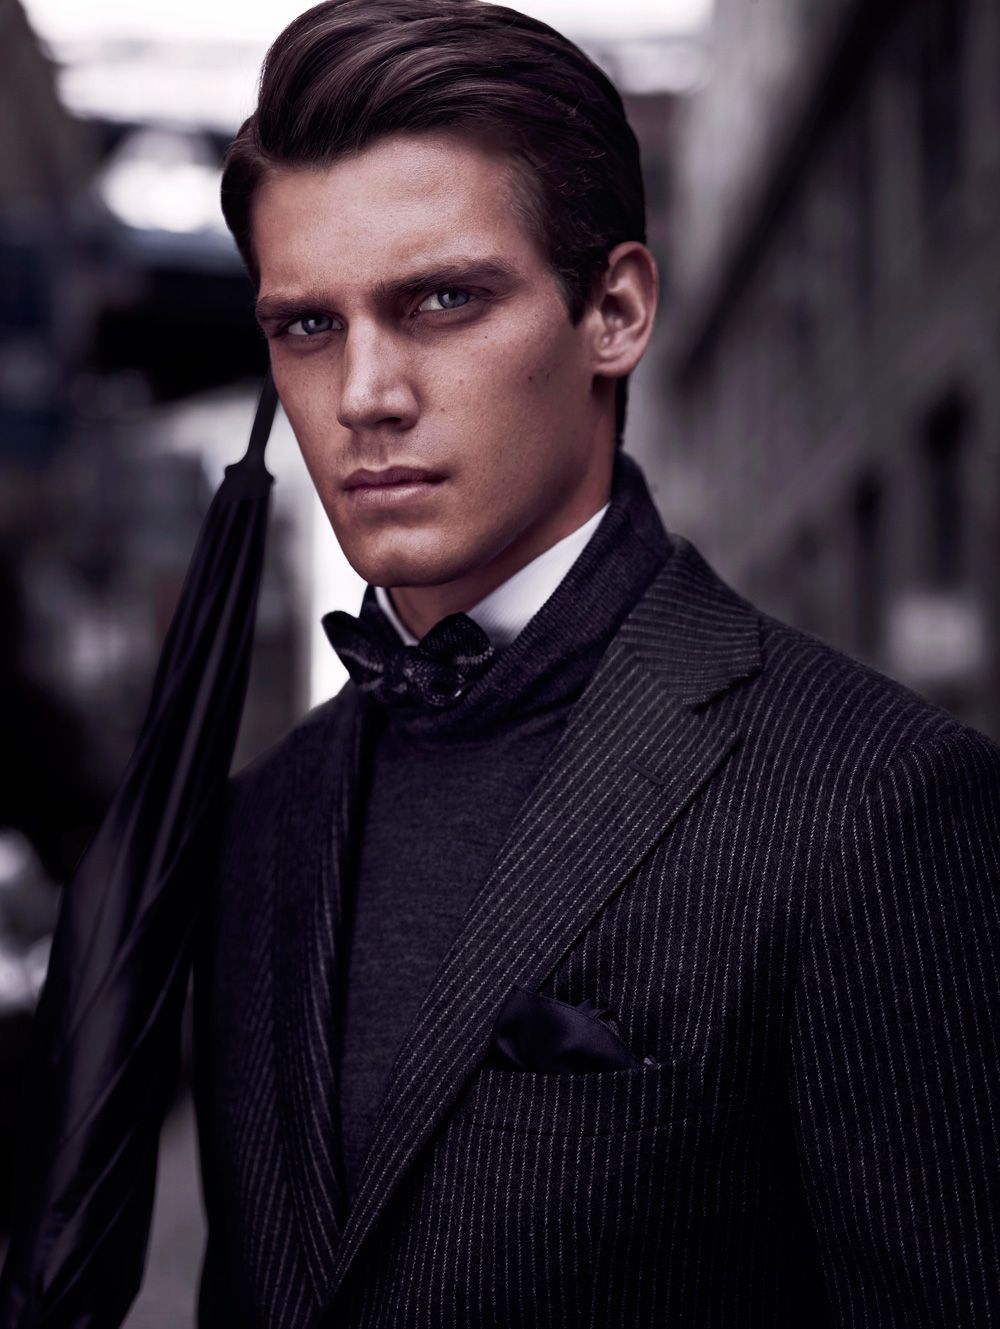 Sean harju male models pinterest man style